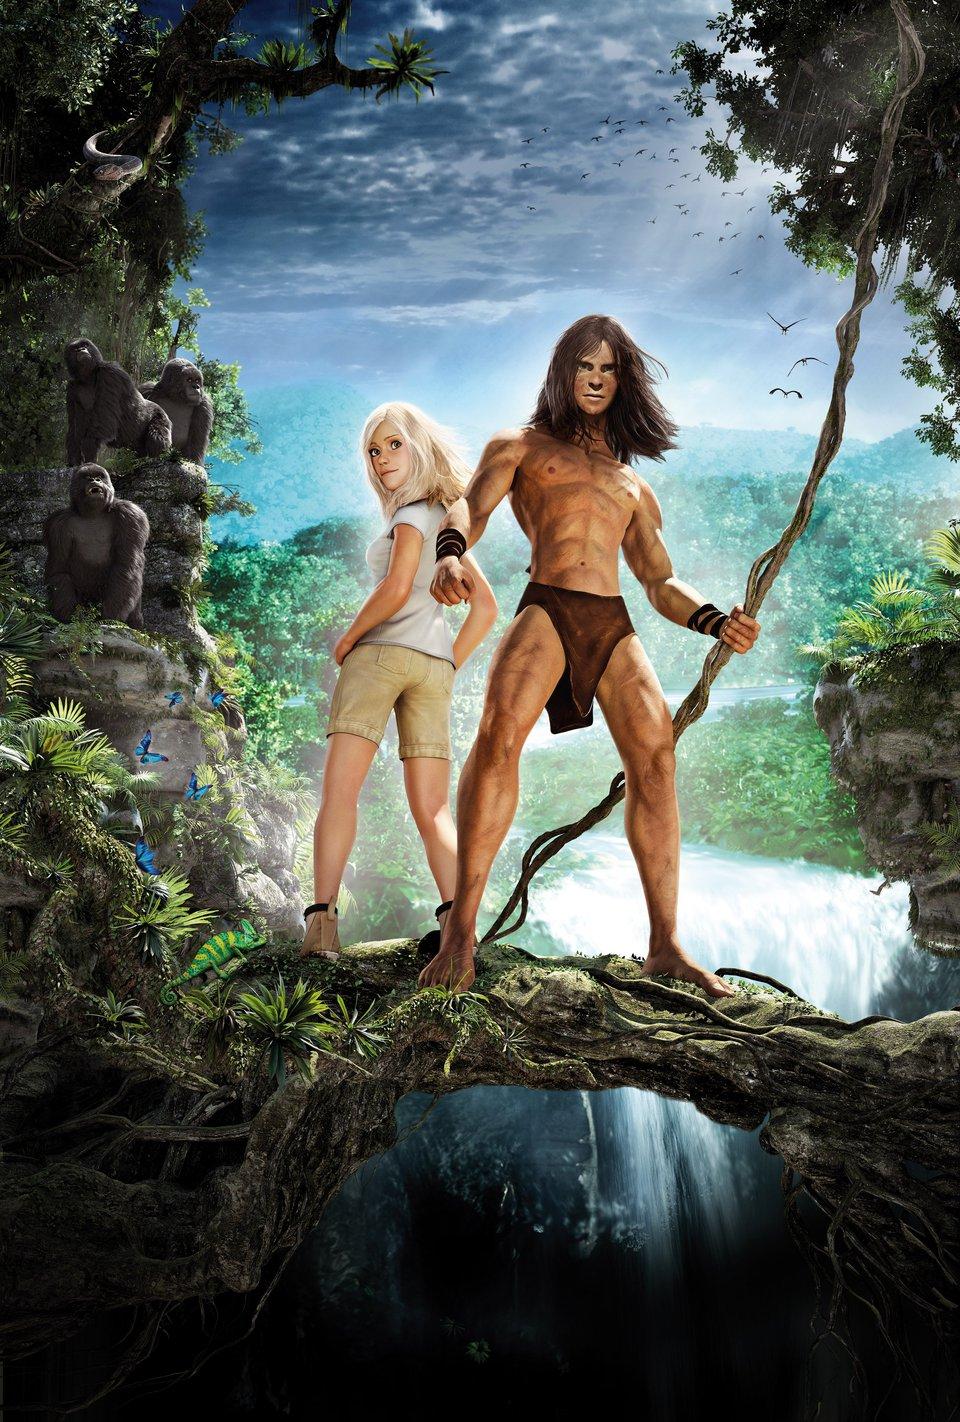 Постер Тарзан. oKino.ua - все о кино, ежедневное интернет издание.